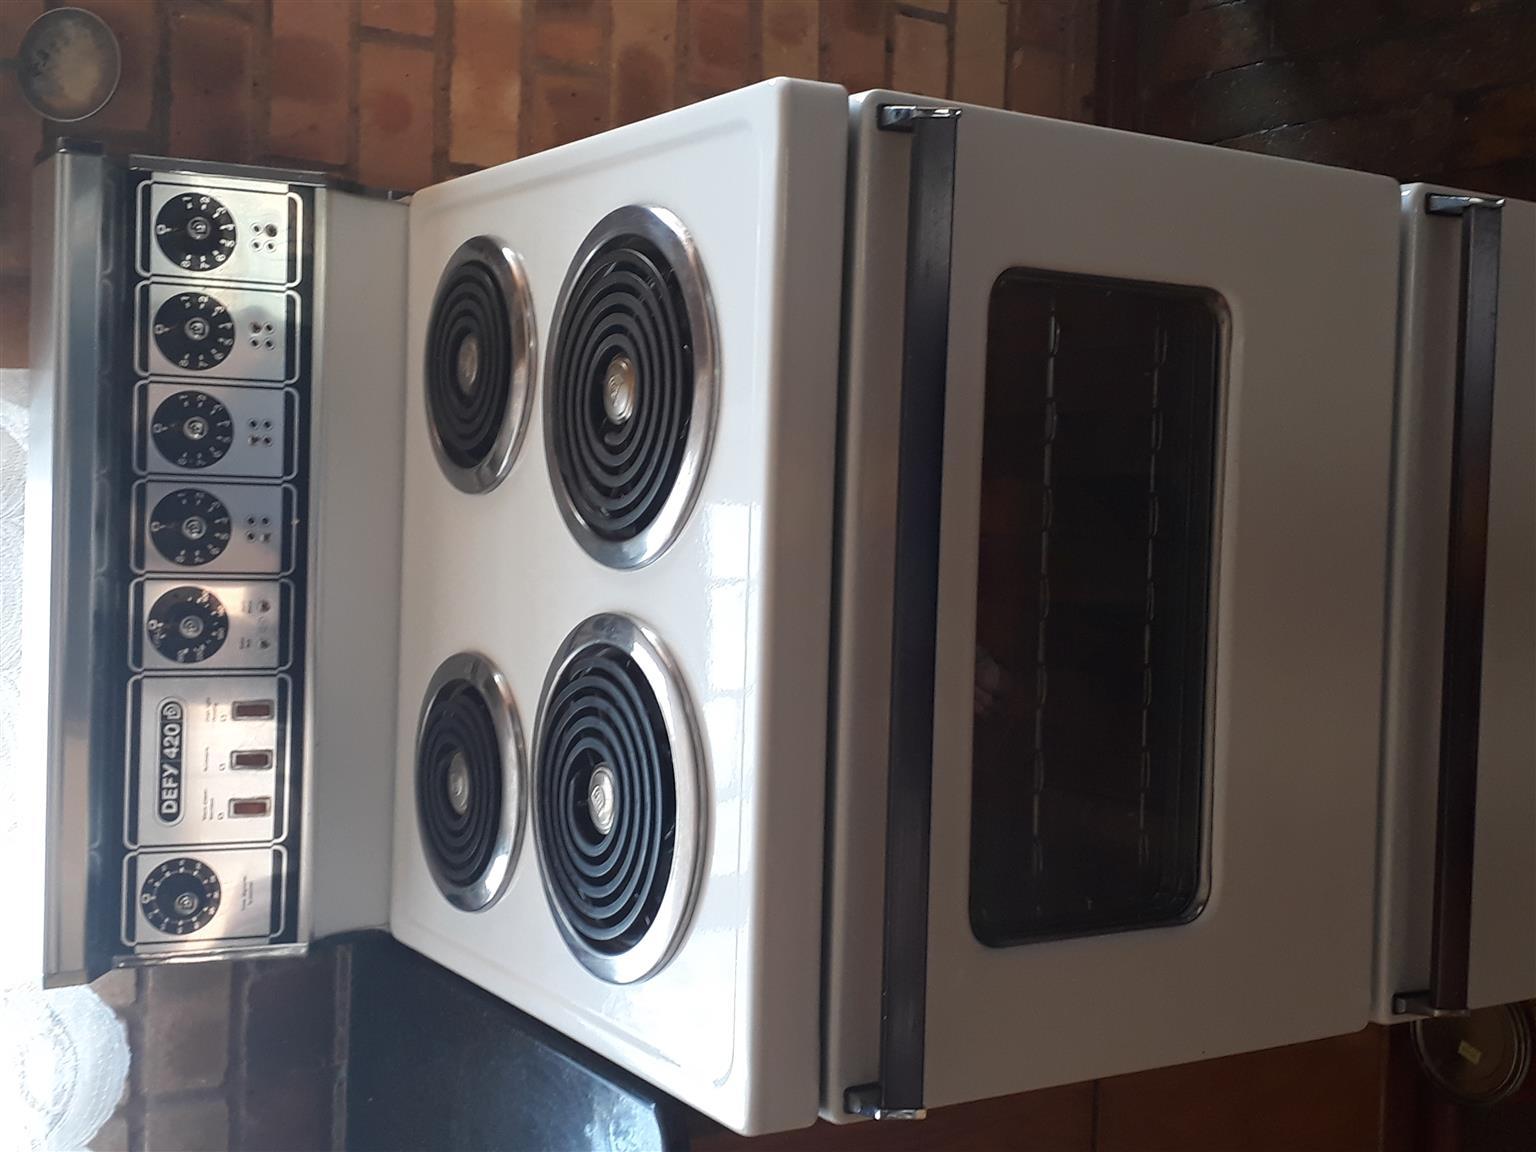 Defy 420 stove